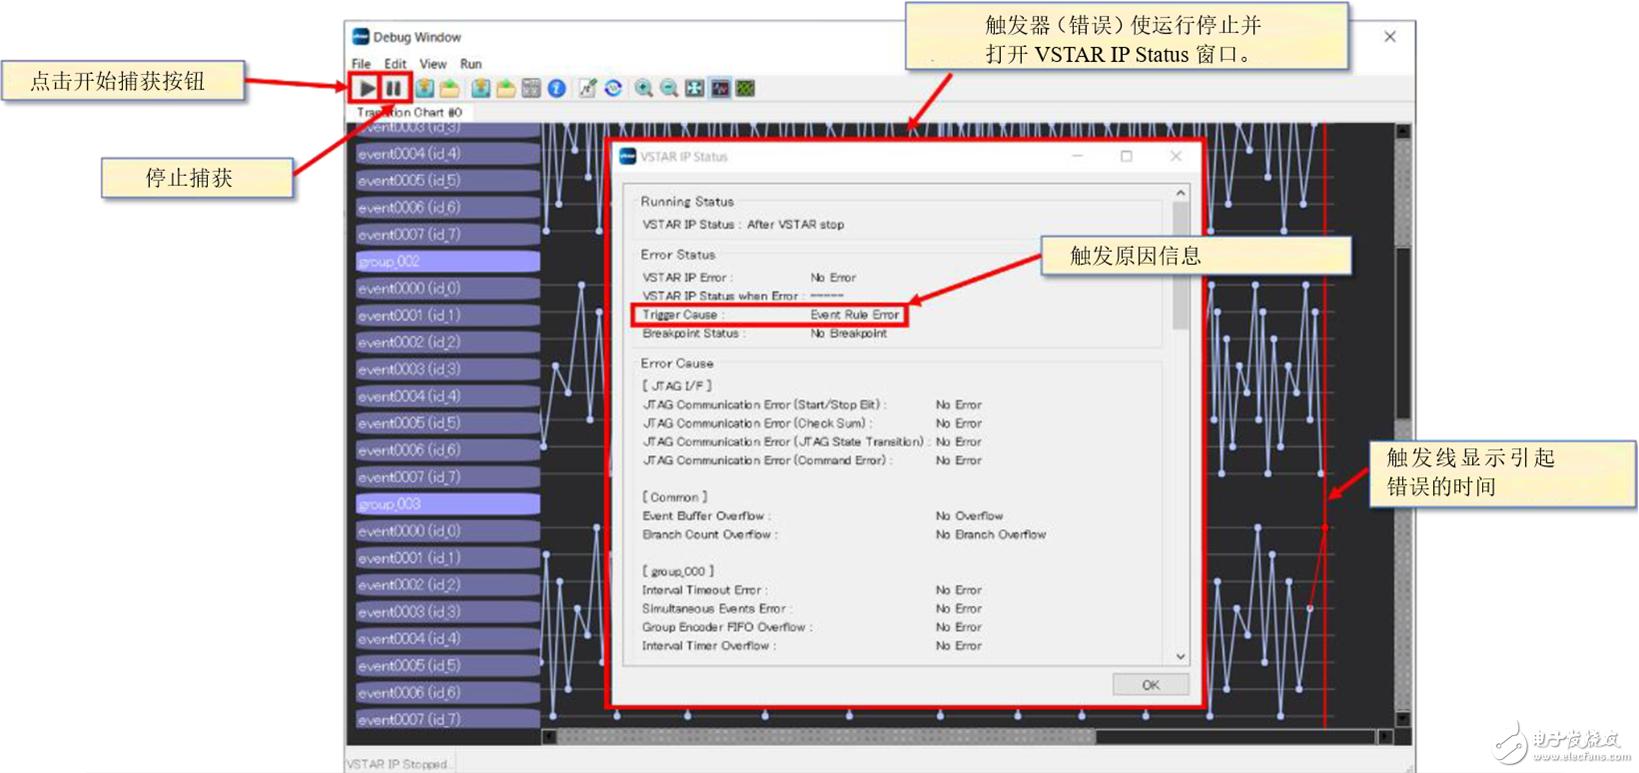 【fpga调试工具】使用vstar监测信号发生顺序|缩短调试周期